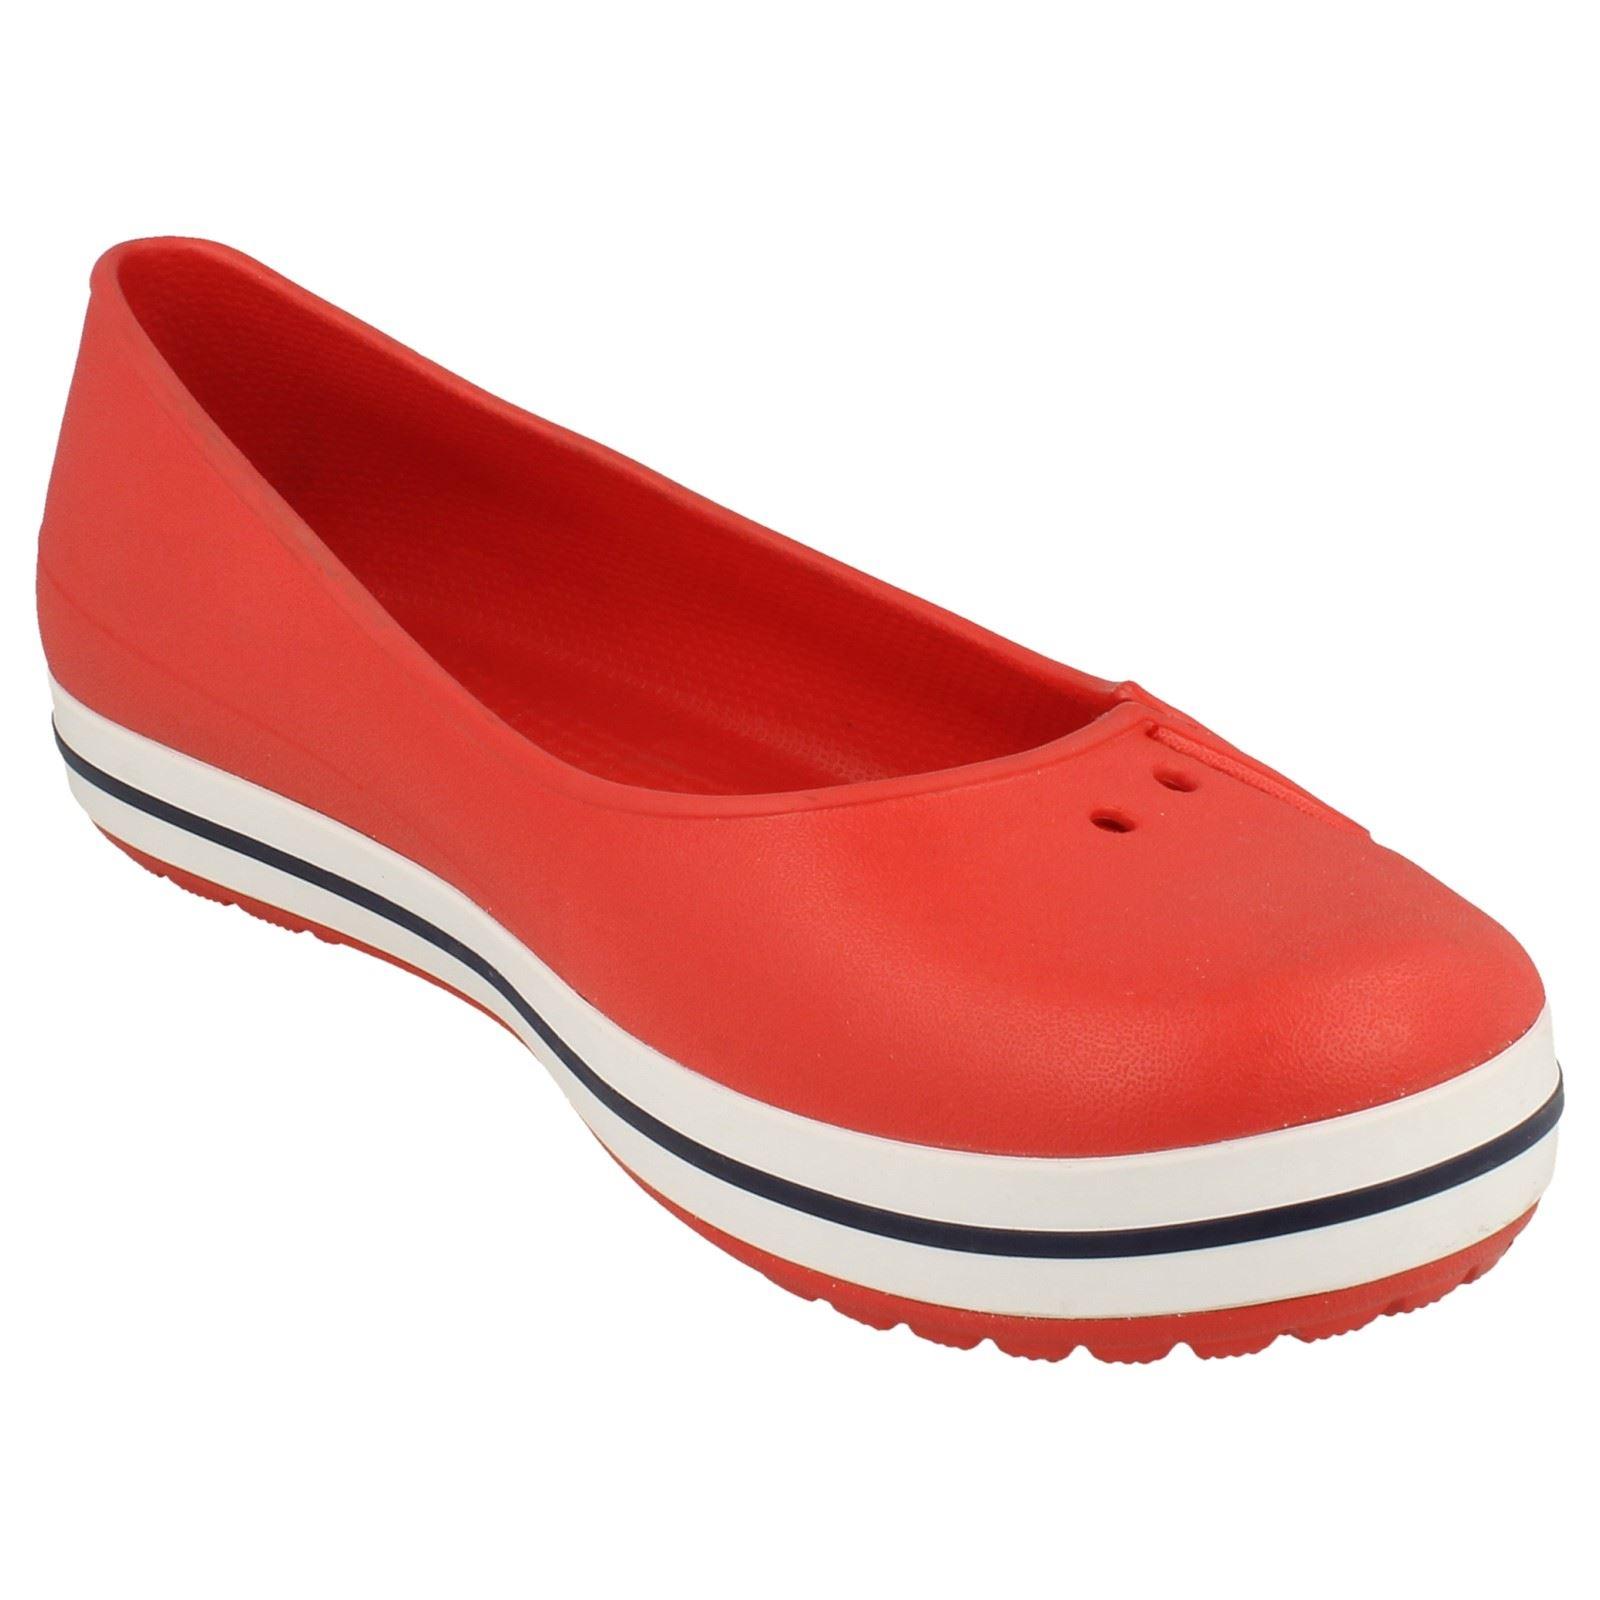 Crocs Crocband Navy And White Shoe